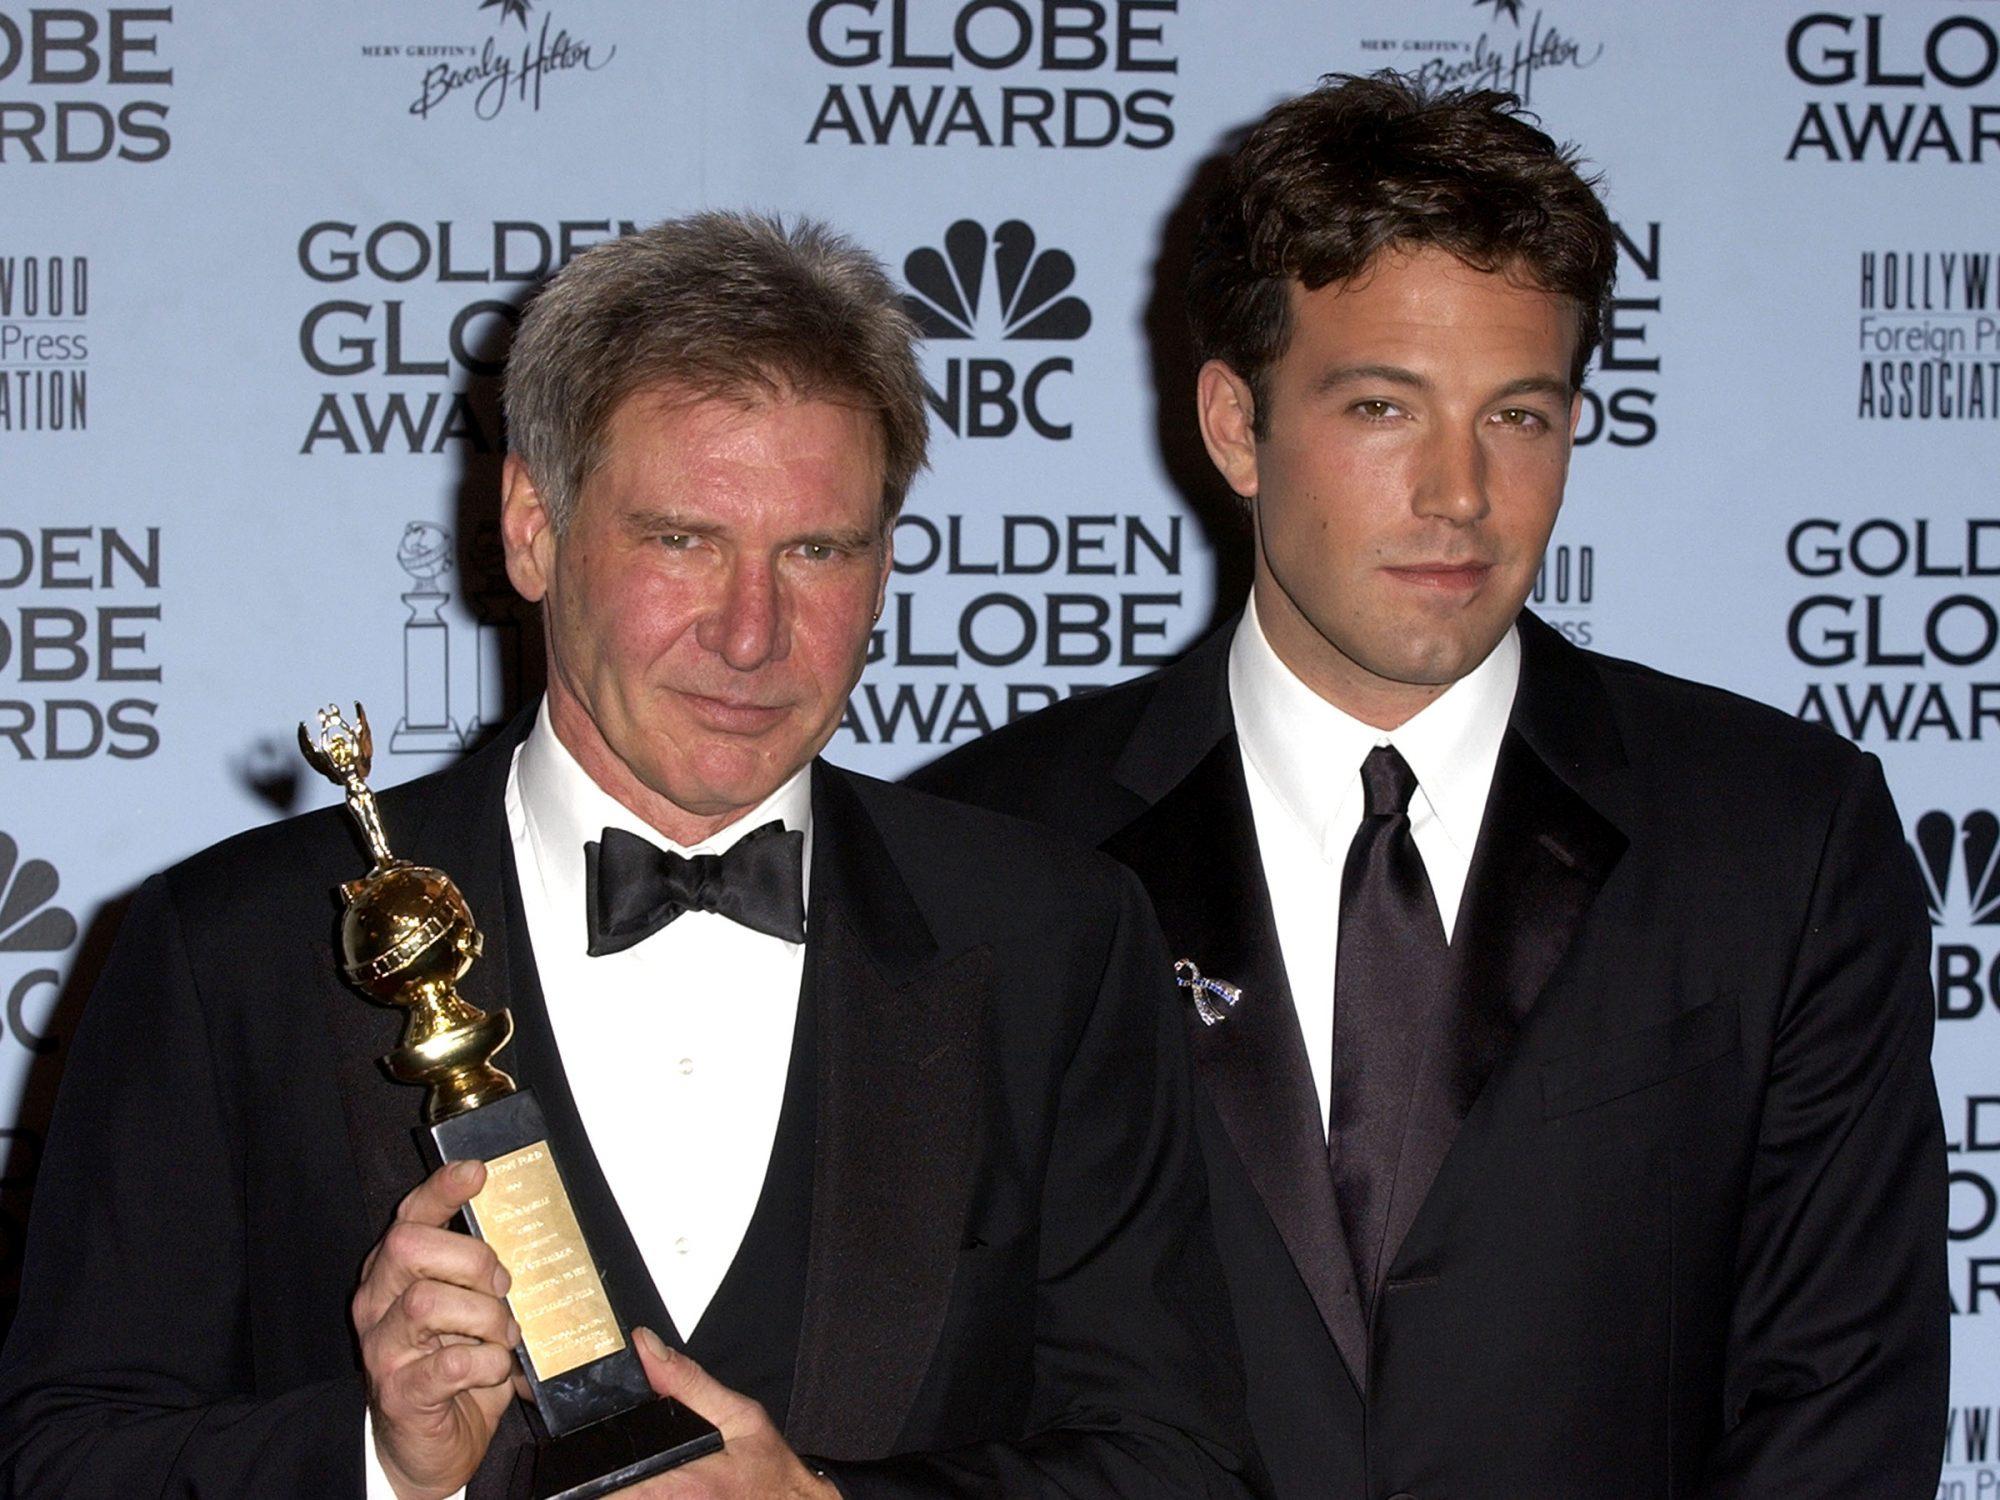 The 59th Annual Golden Globe Awards - Press Room